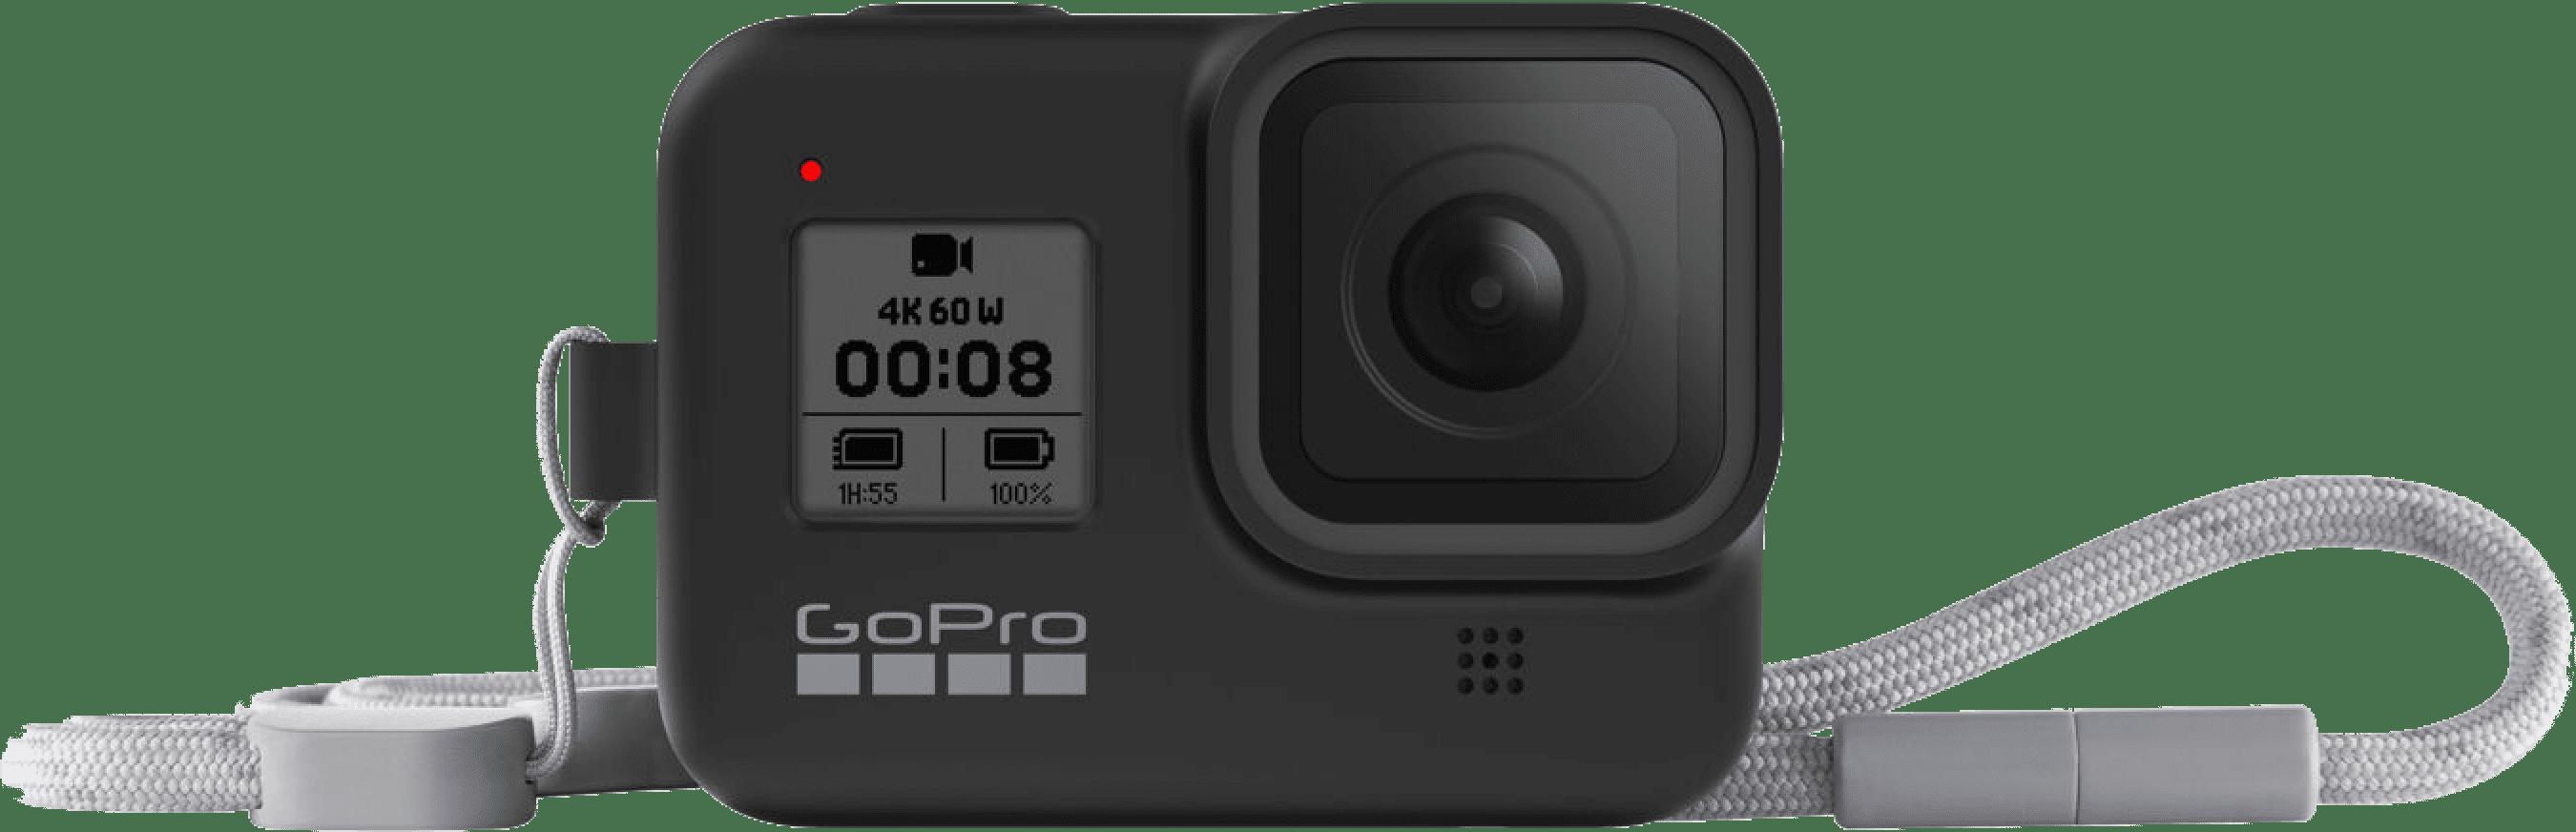 HERO8 Black Sleeve + Lanyard-front-image